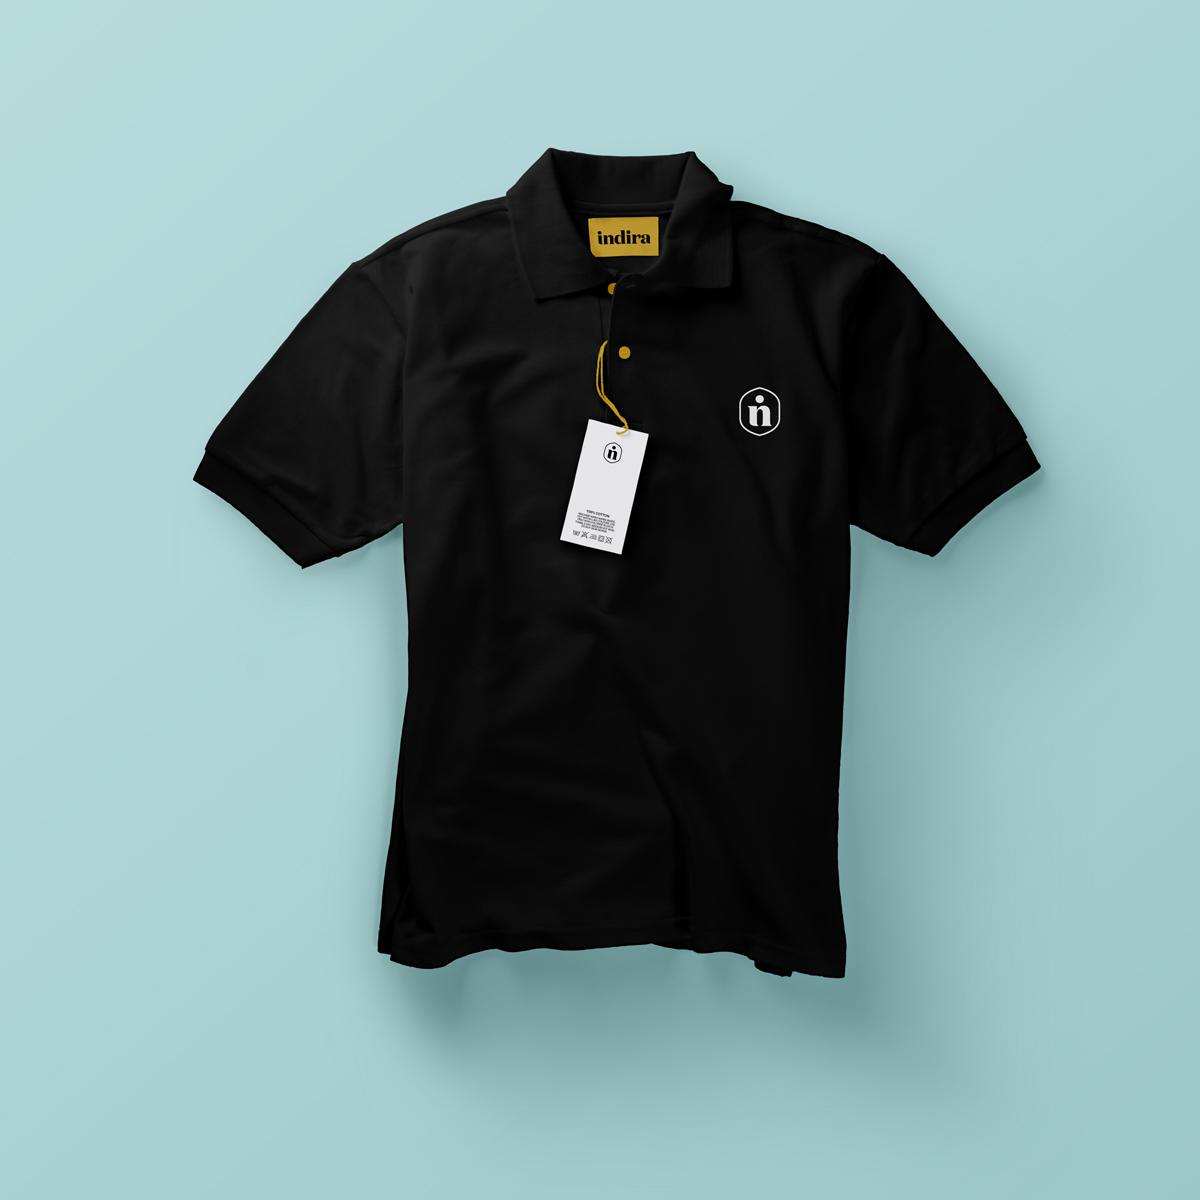 indira-Polo-Shirt